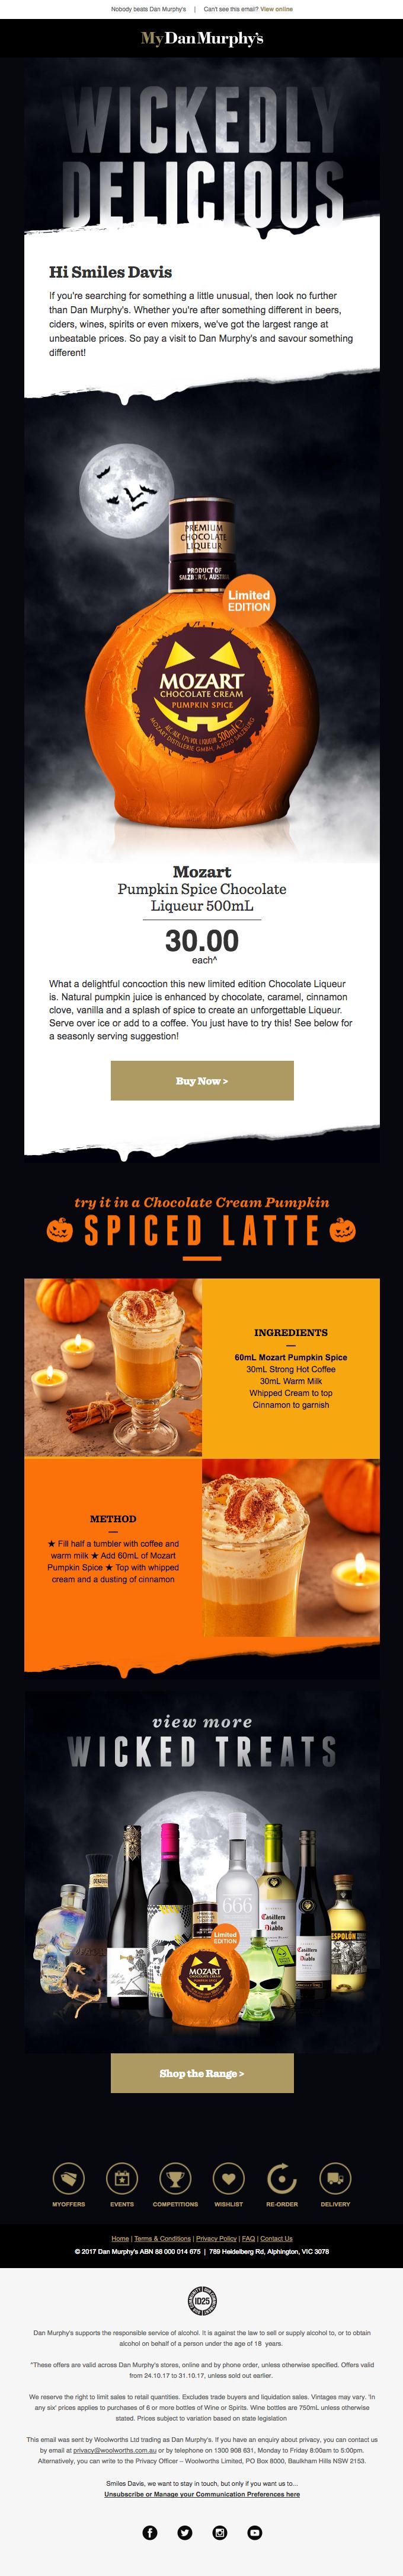 Hi Smiles Davis – 🎃 Treat yourself to Mozart's Chocolate Cream Pumpkin Spice Liqueur, at the lowest price!